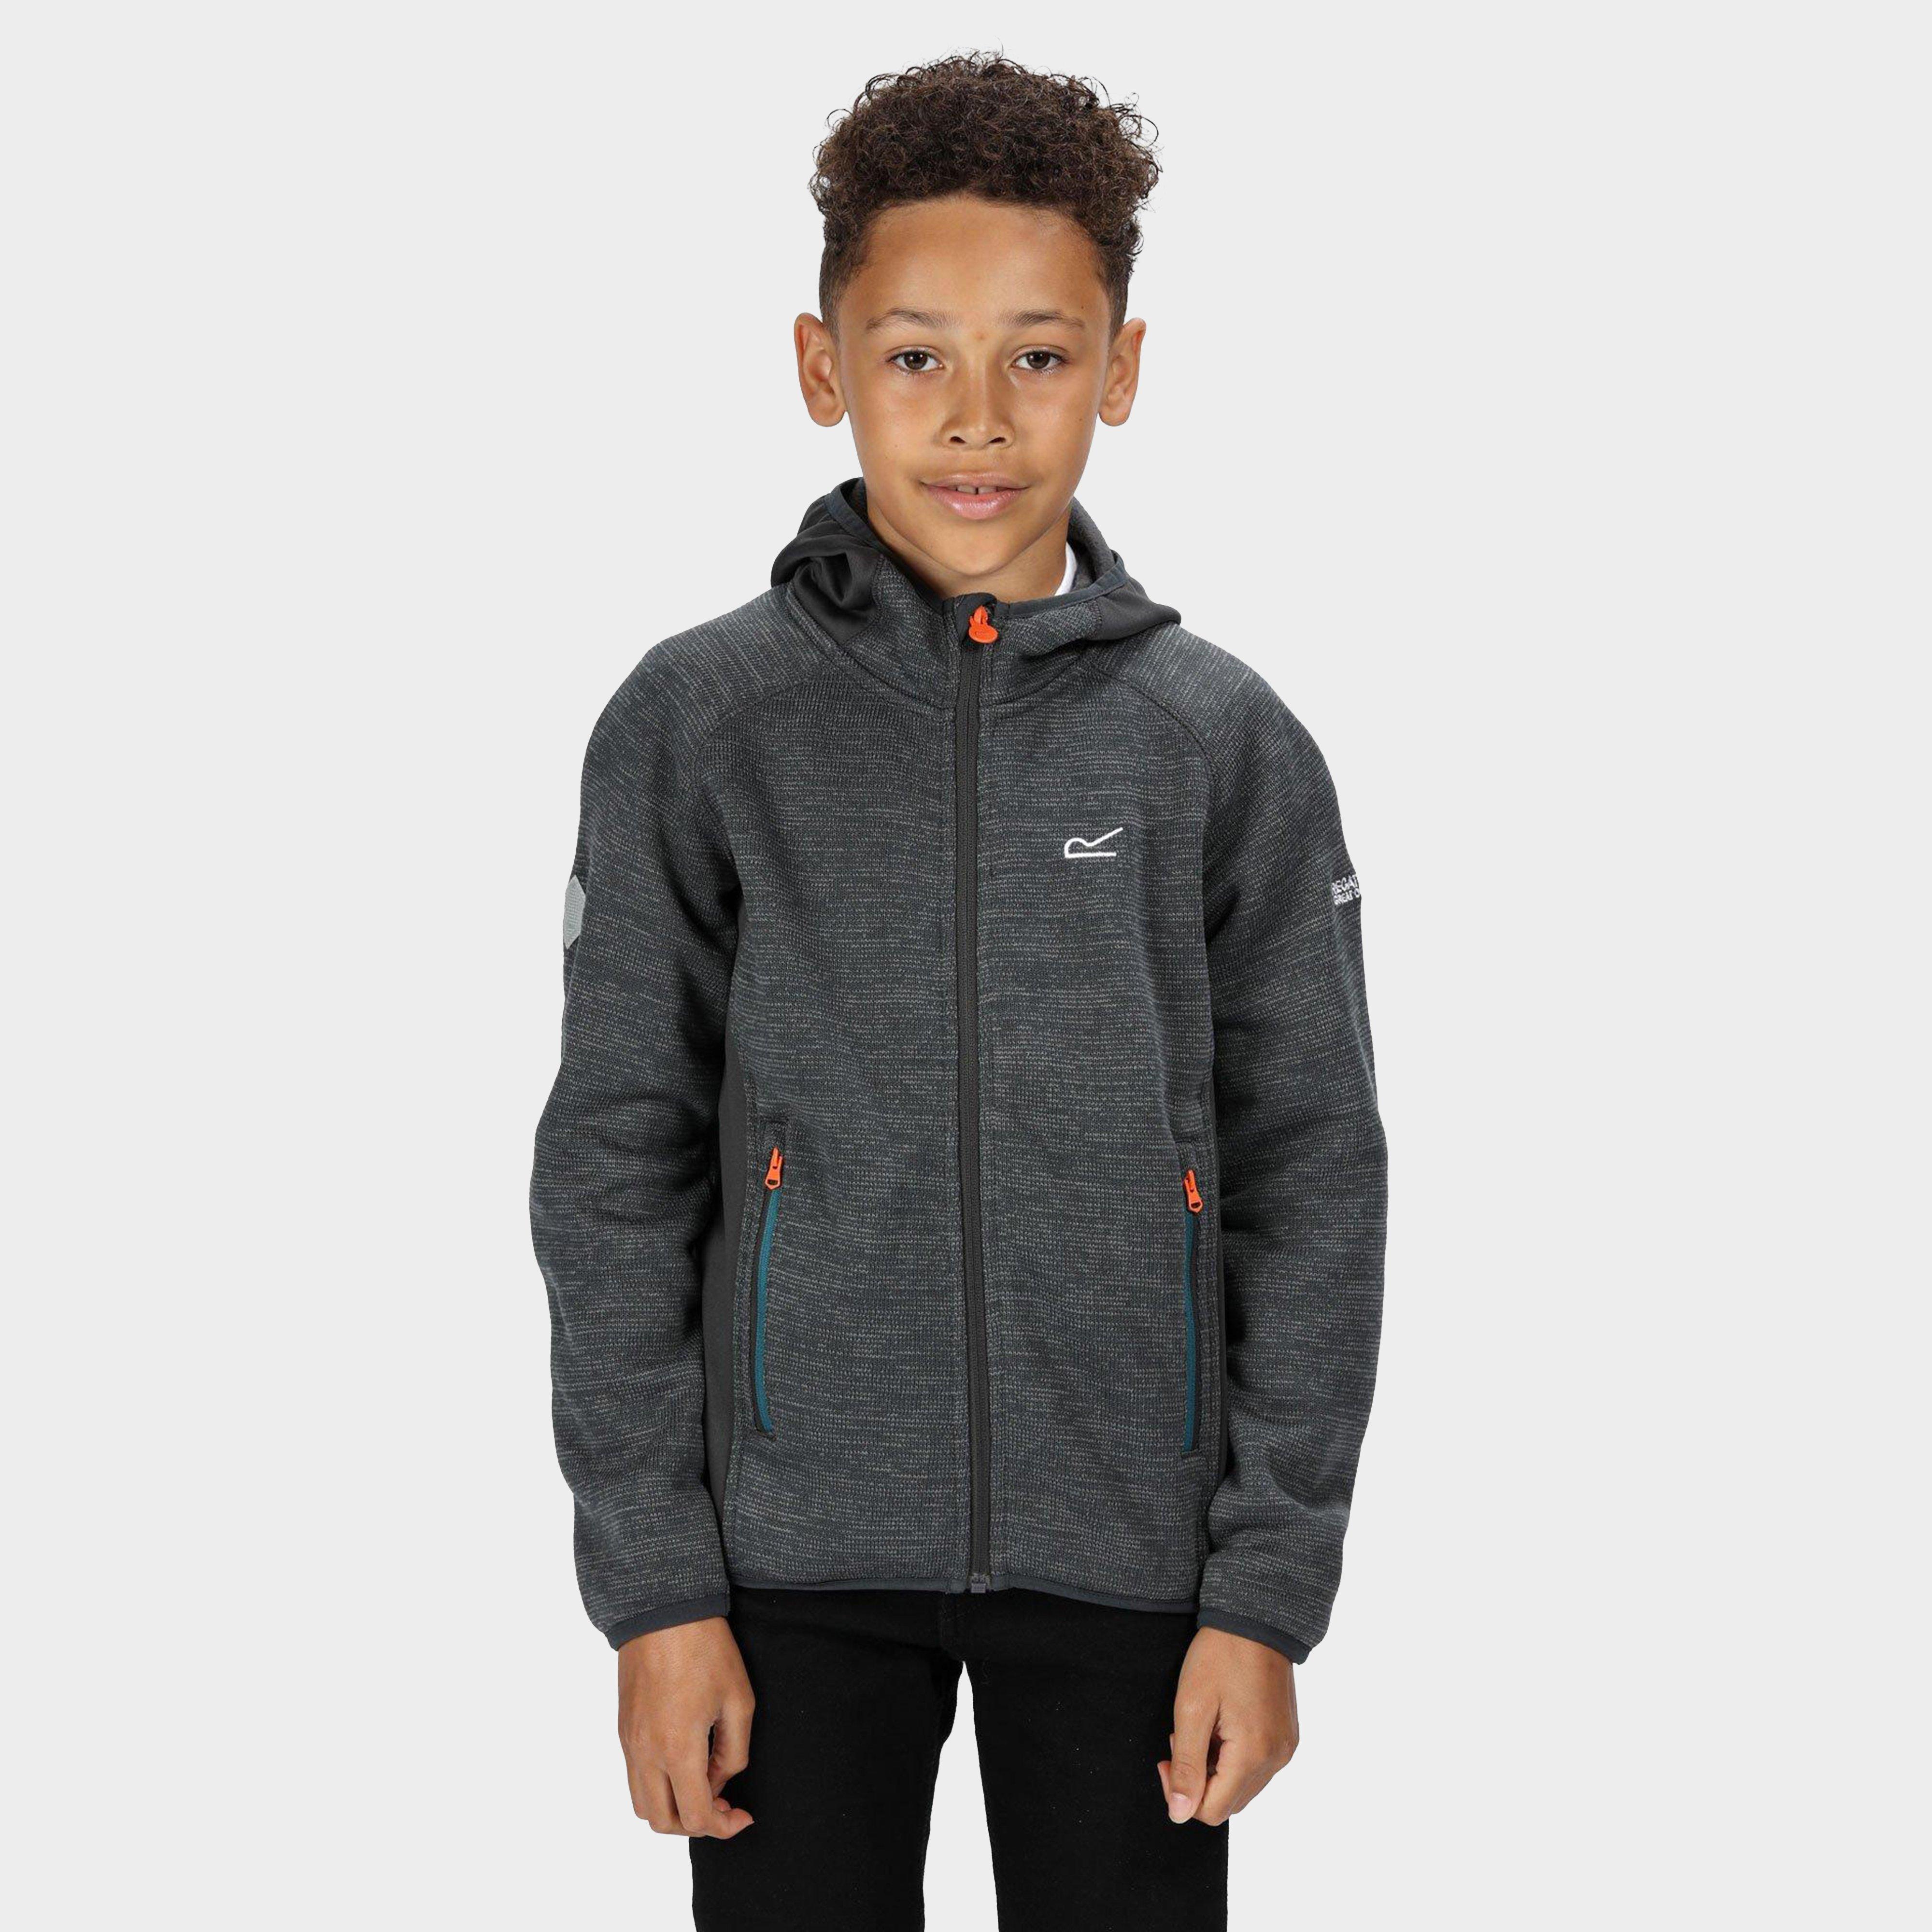 Regatta Kids' Dissolver Ii Fleece - Grey, Grey